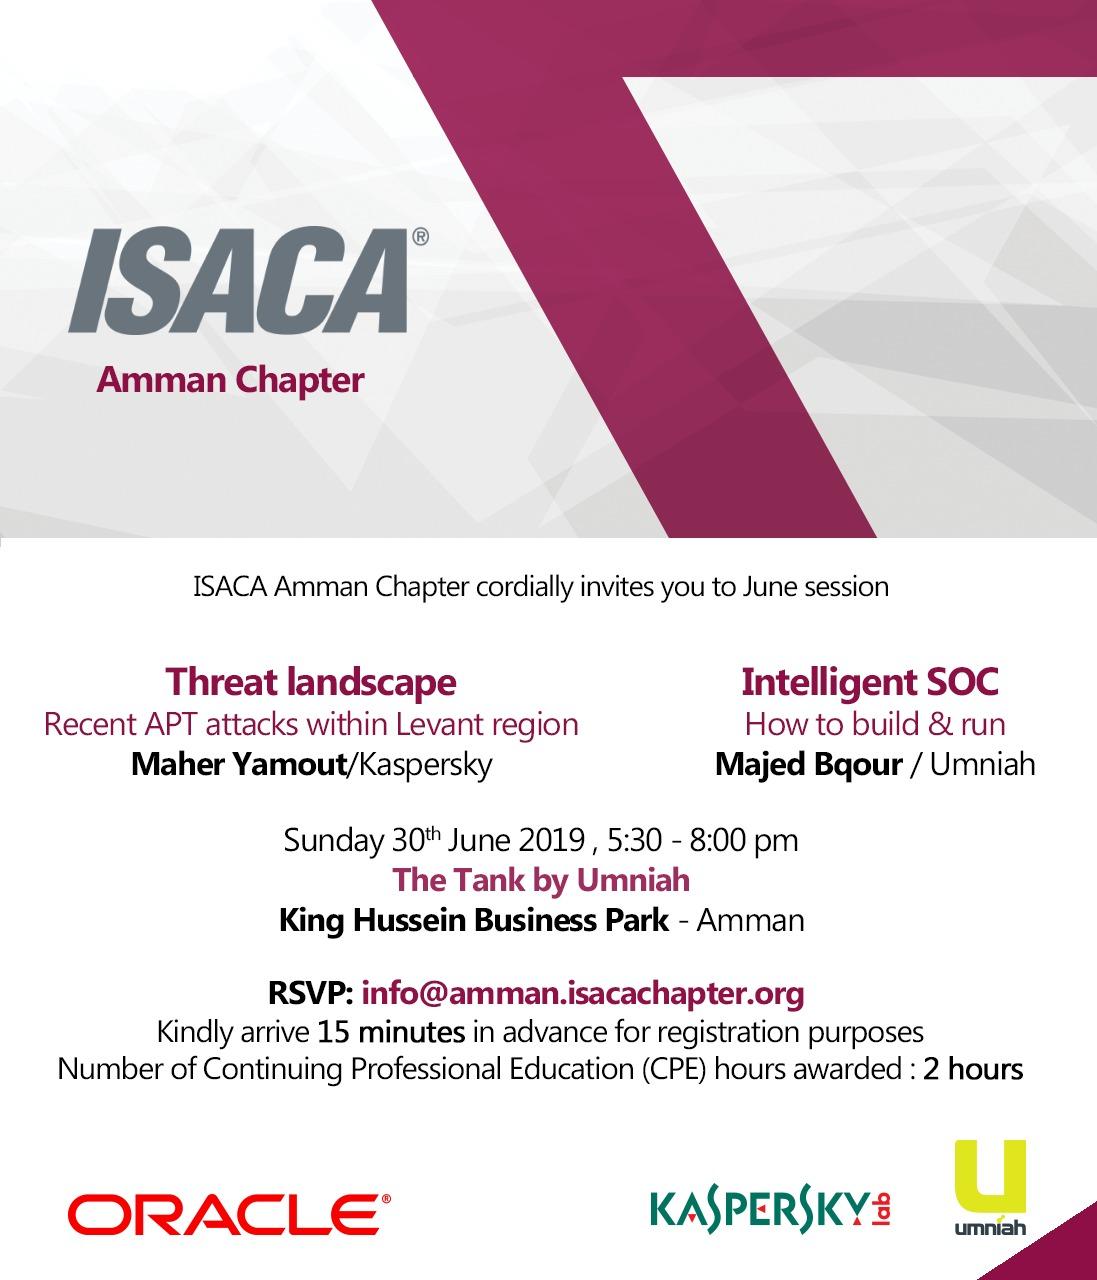 JUNE Session - Threat landscape & Intelligent SOC - Amman Chapter